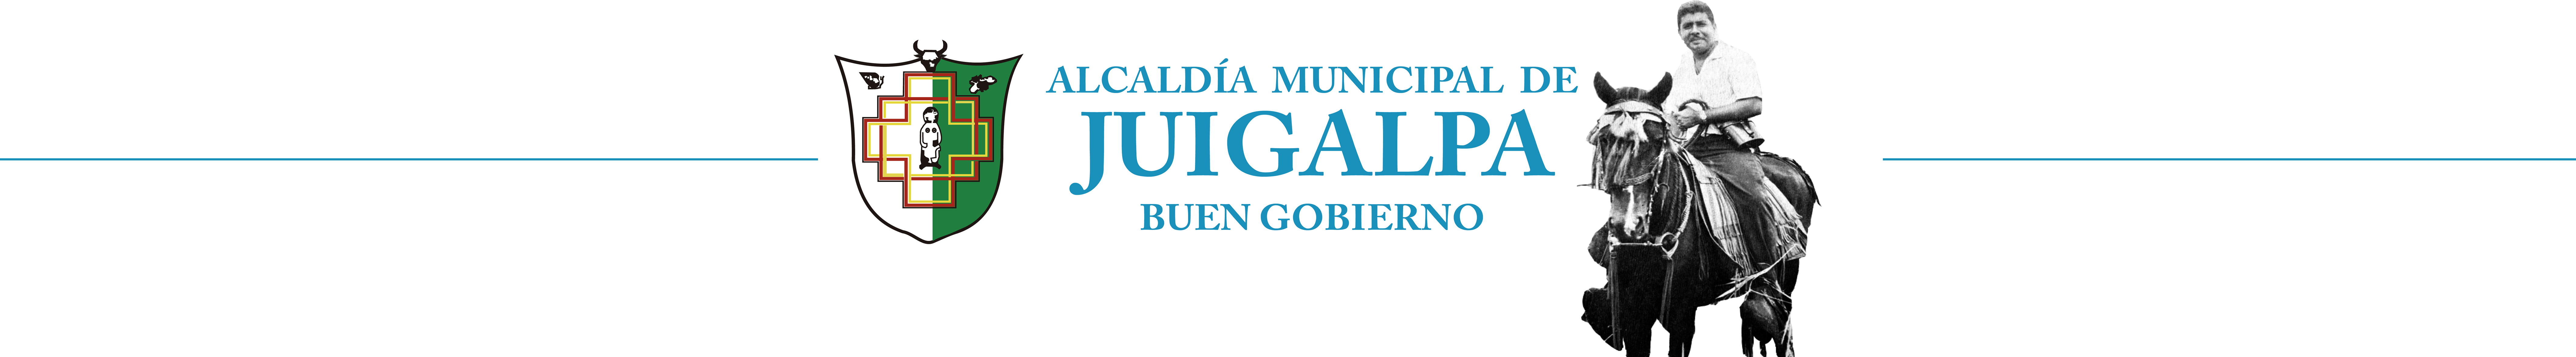 Alcaldía de Juigalpa